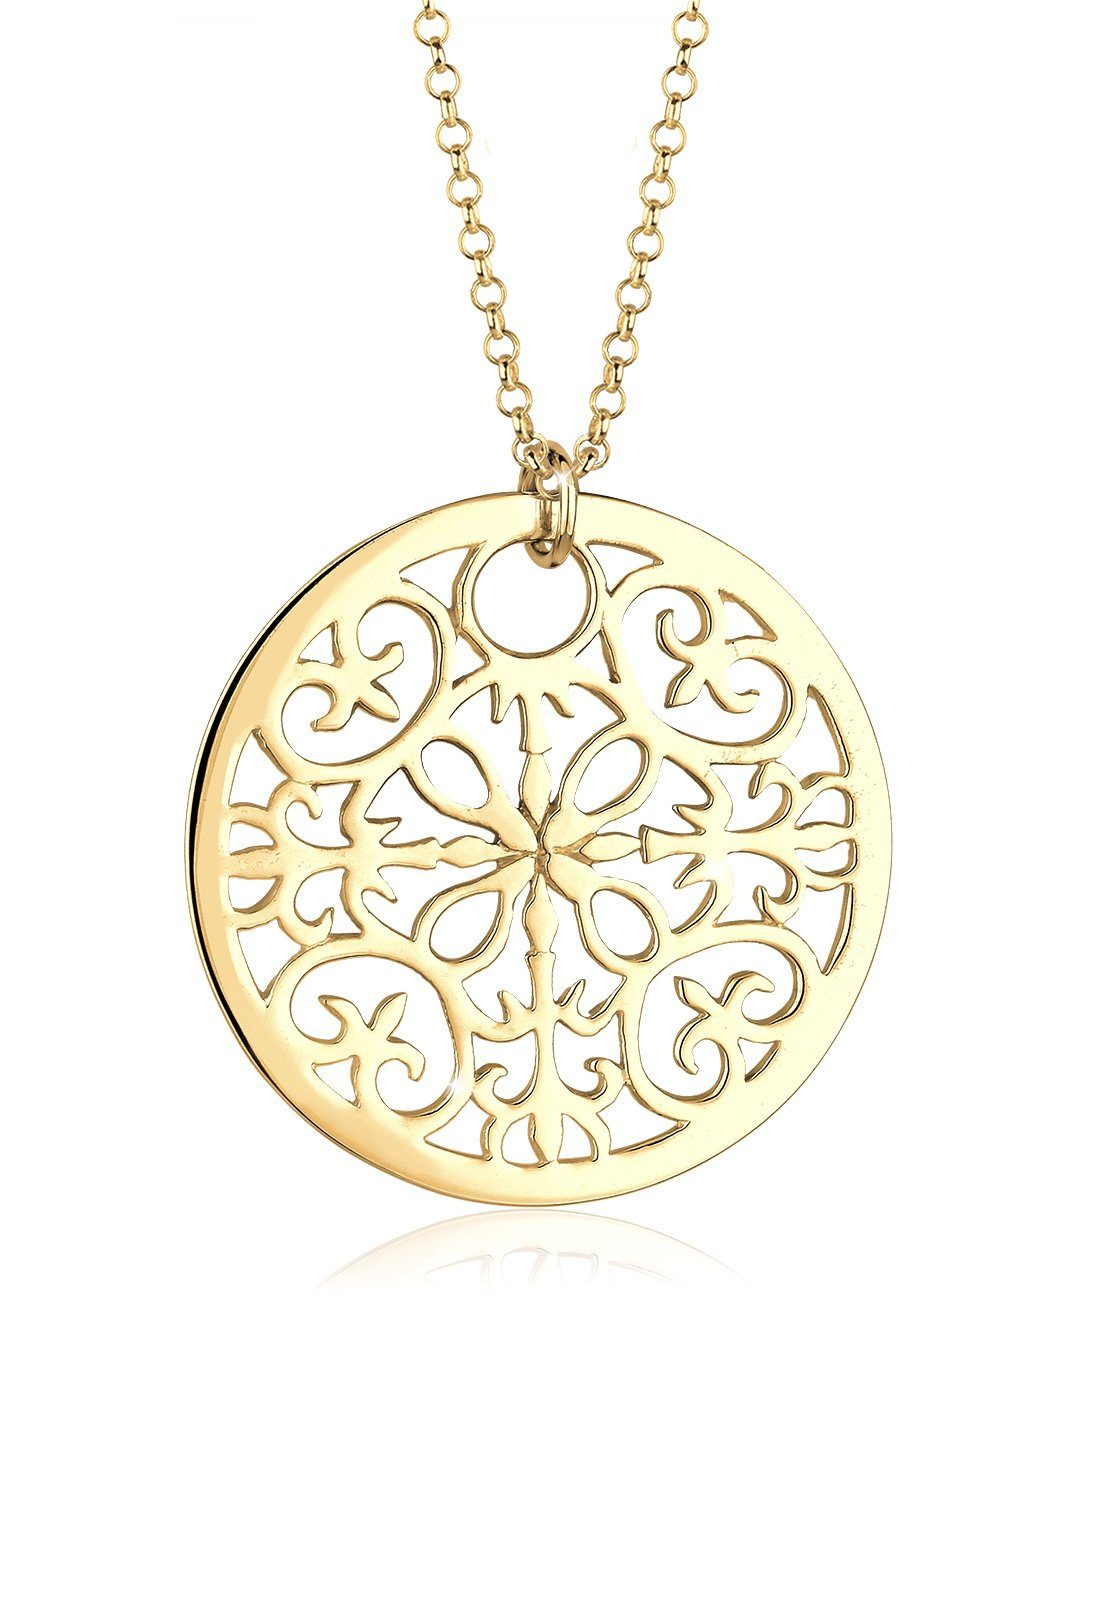 GOLDHIMMEL Kette mit Anhänger »Münze Ornament Kreis 925 Sterling Silber«